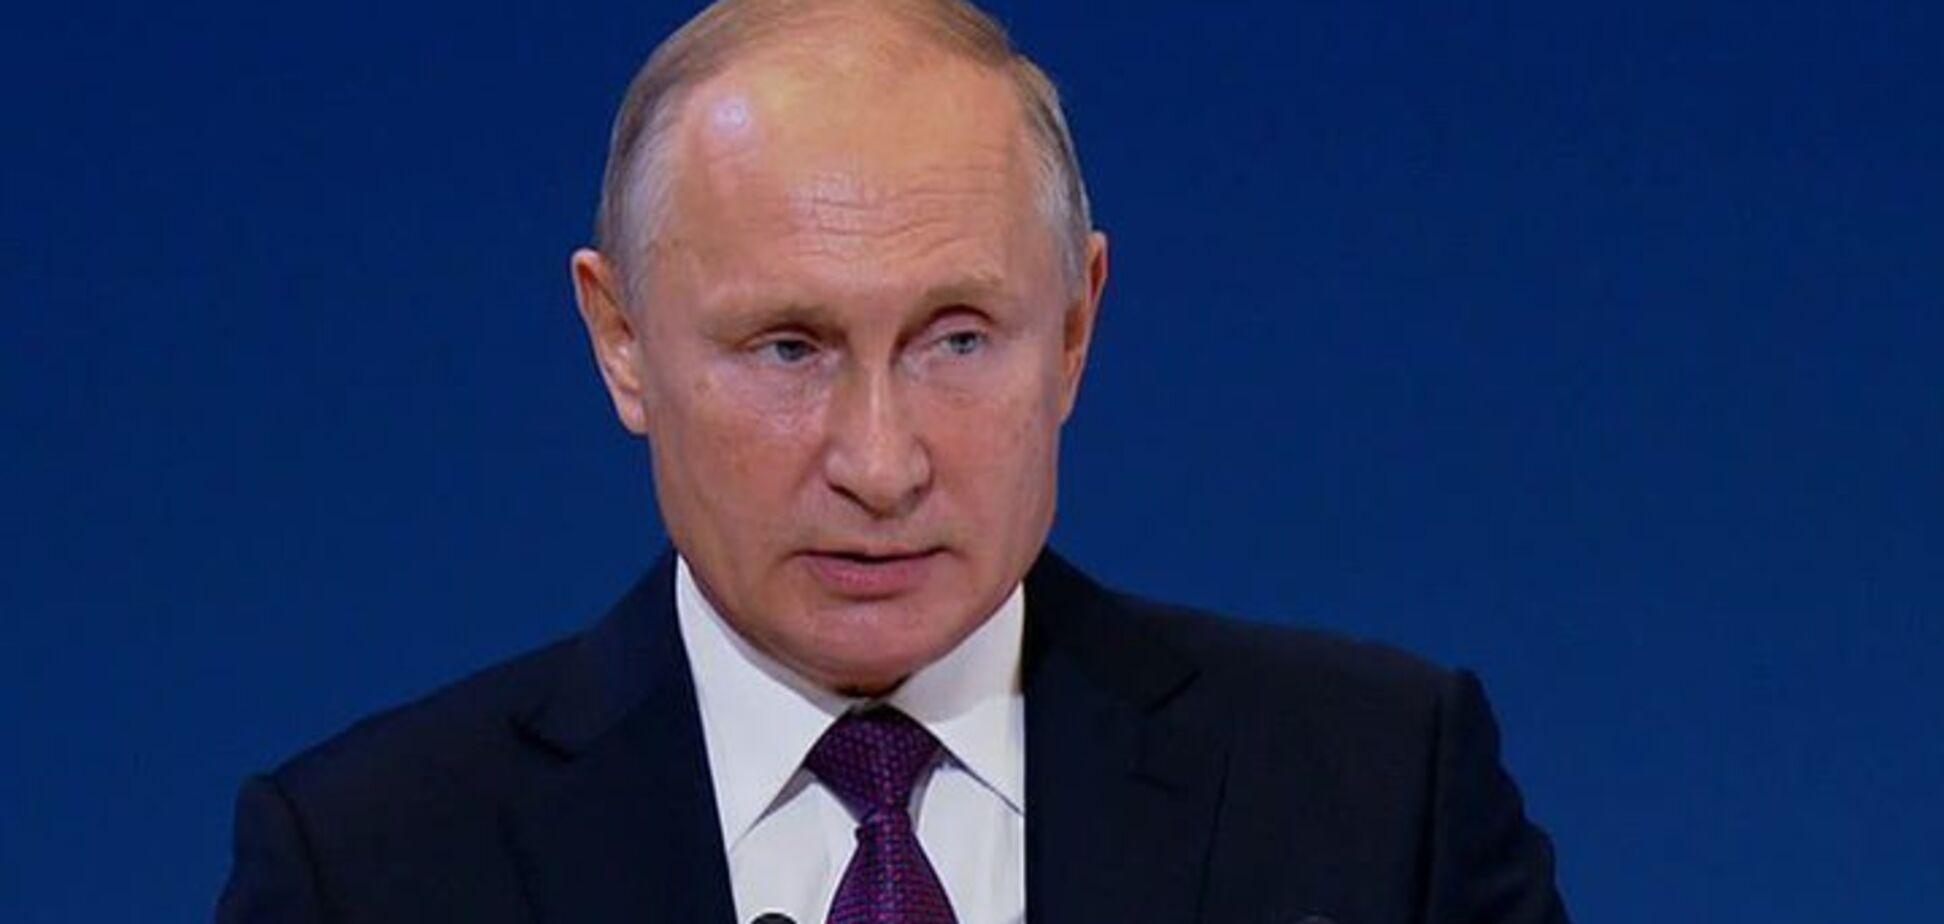 'Русофобия!' Путин пригрозил последствиями за вмешательство в жизнь РПЦ